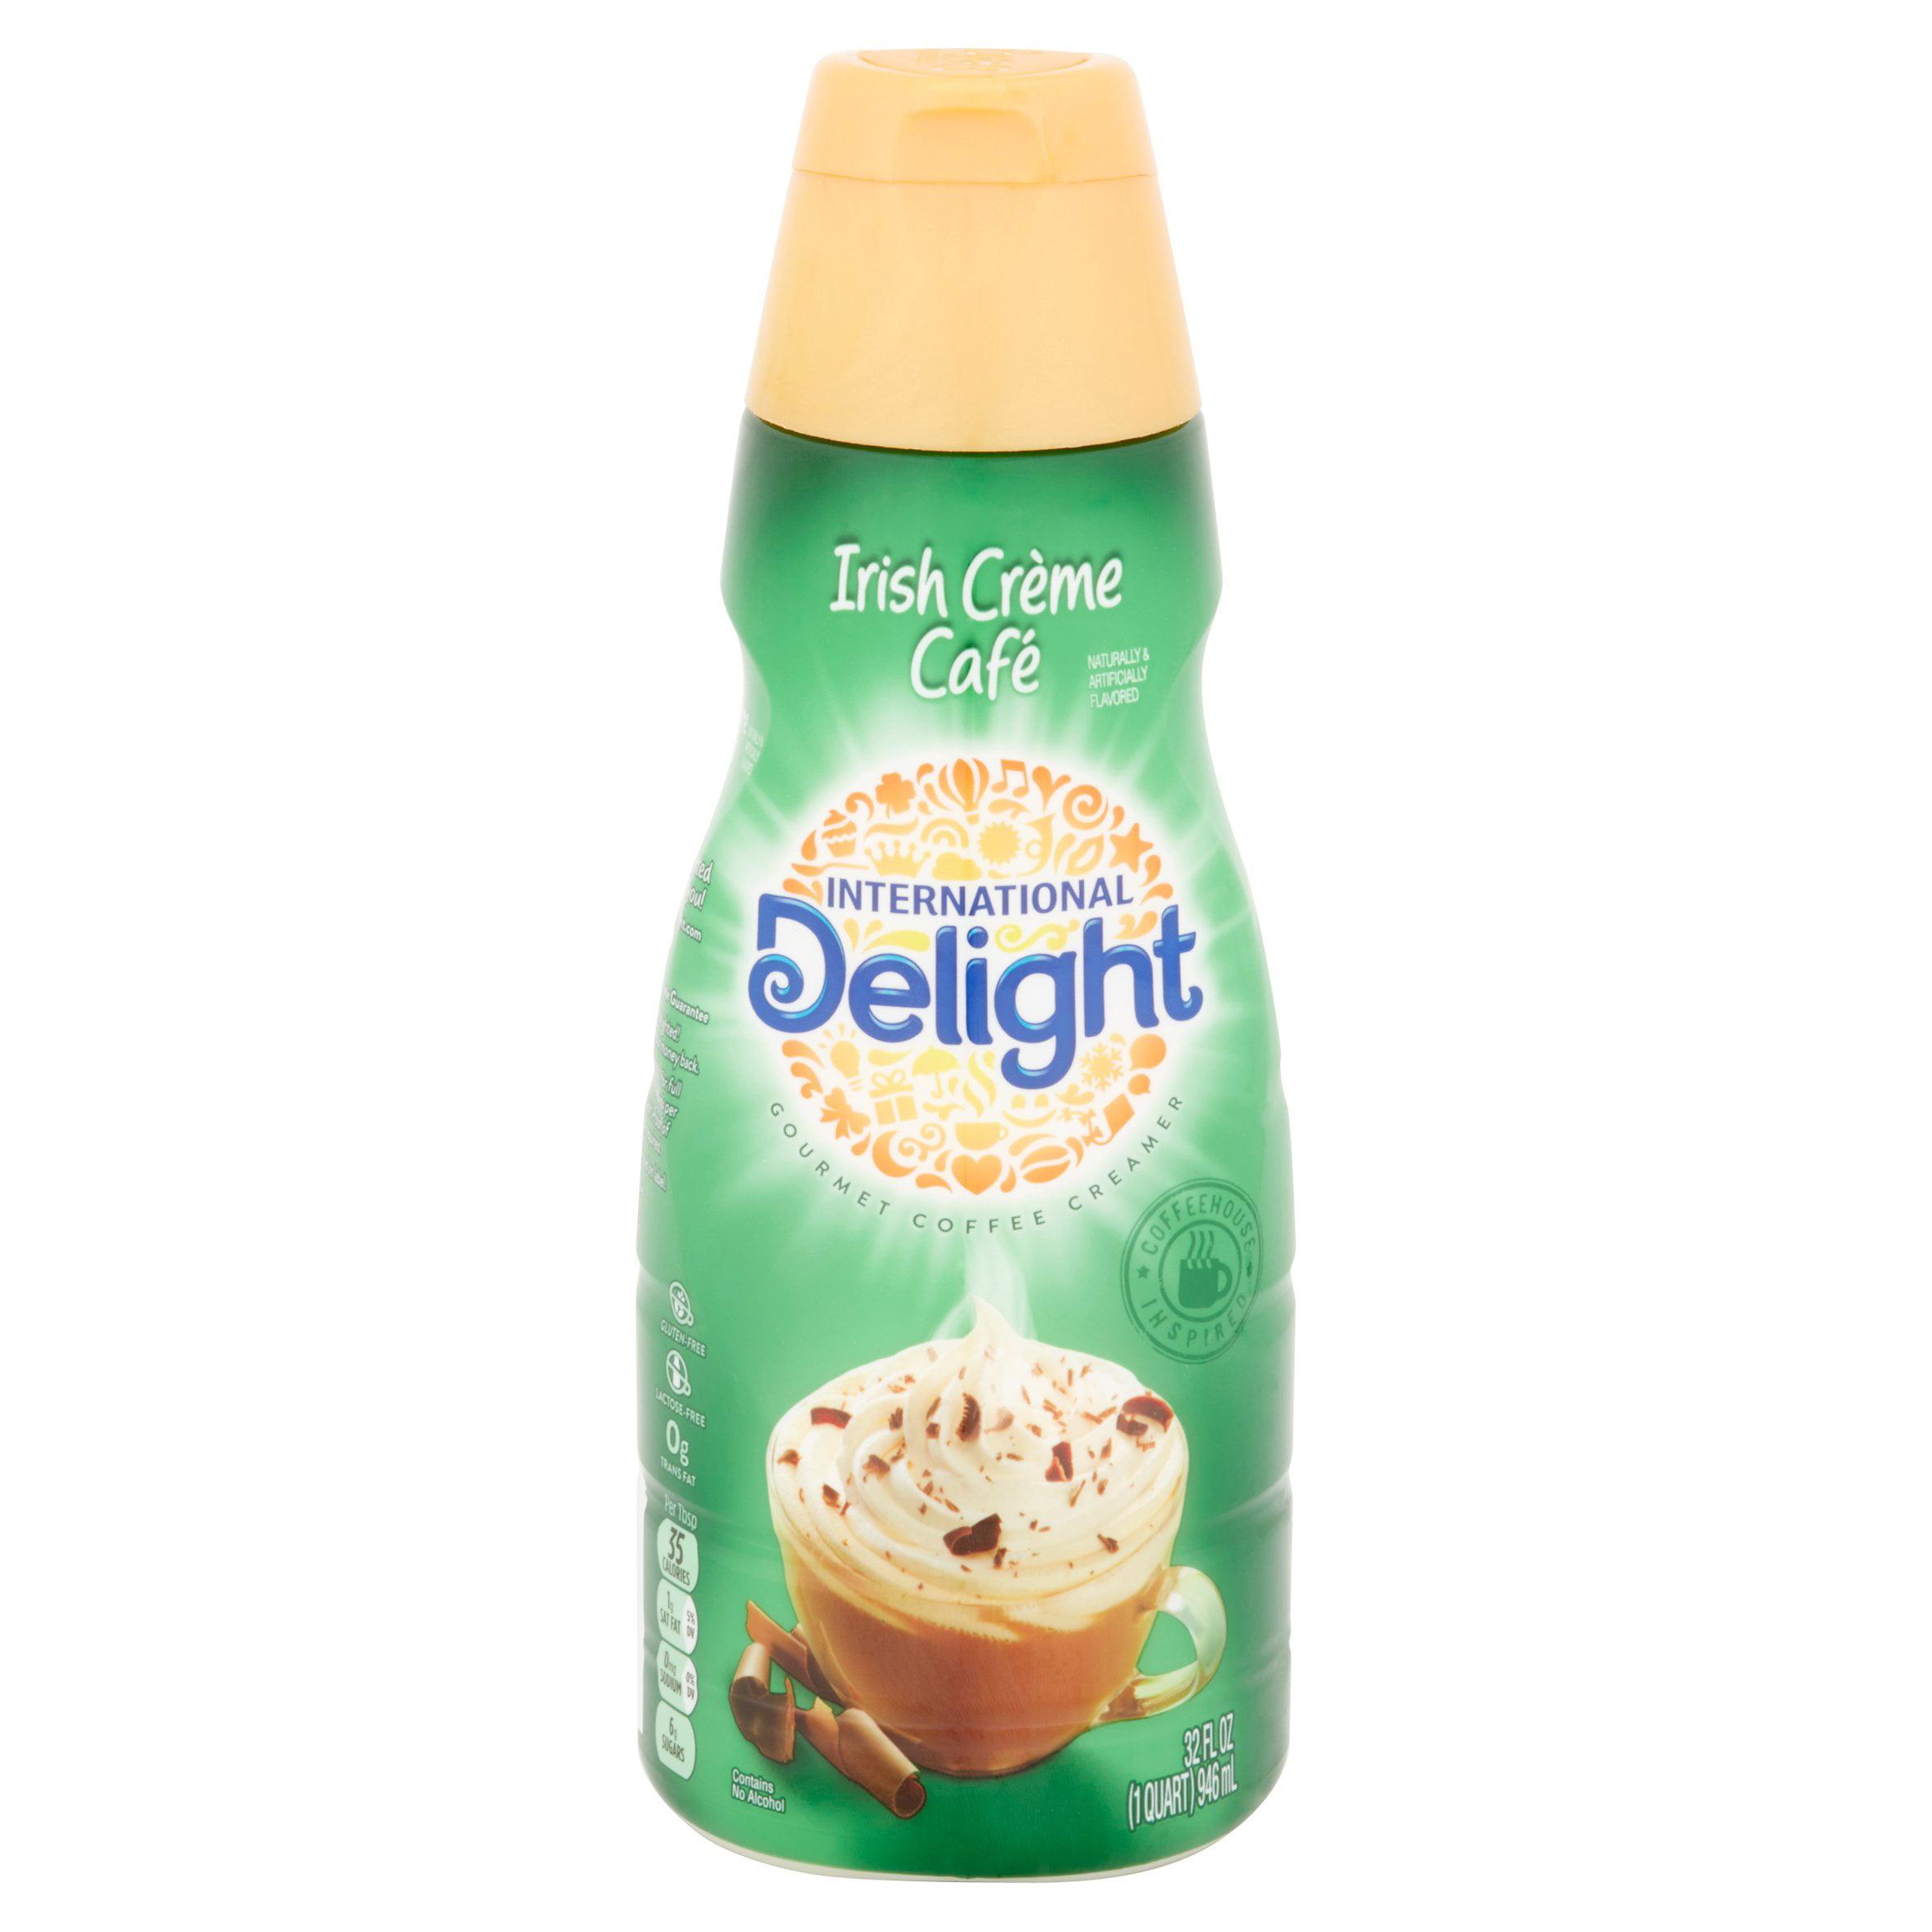 International Delight, Irish Creme Coffee Creamer, 32 Oz. - Walmart.com